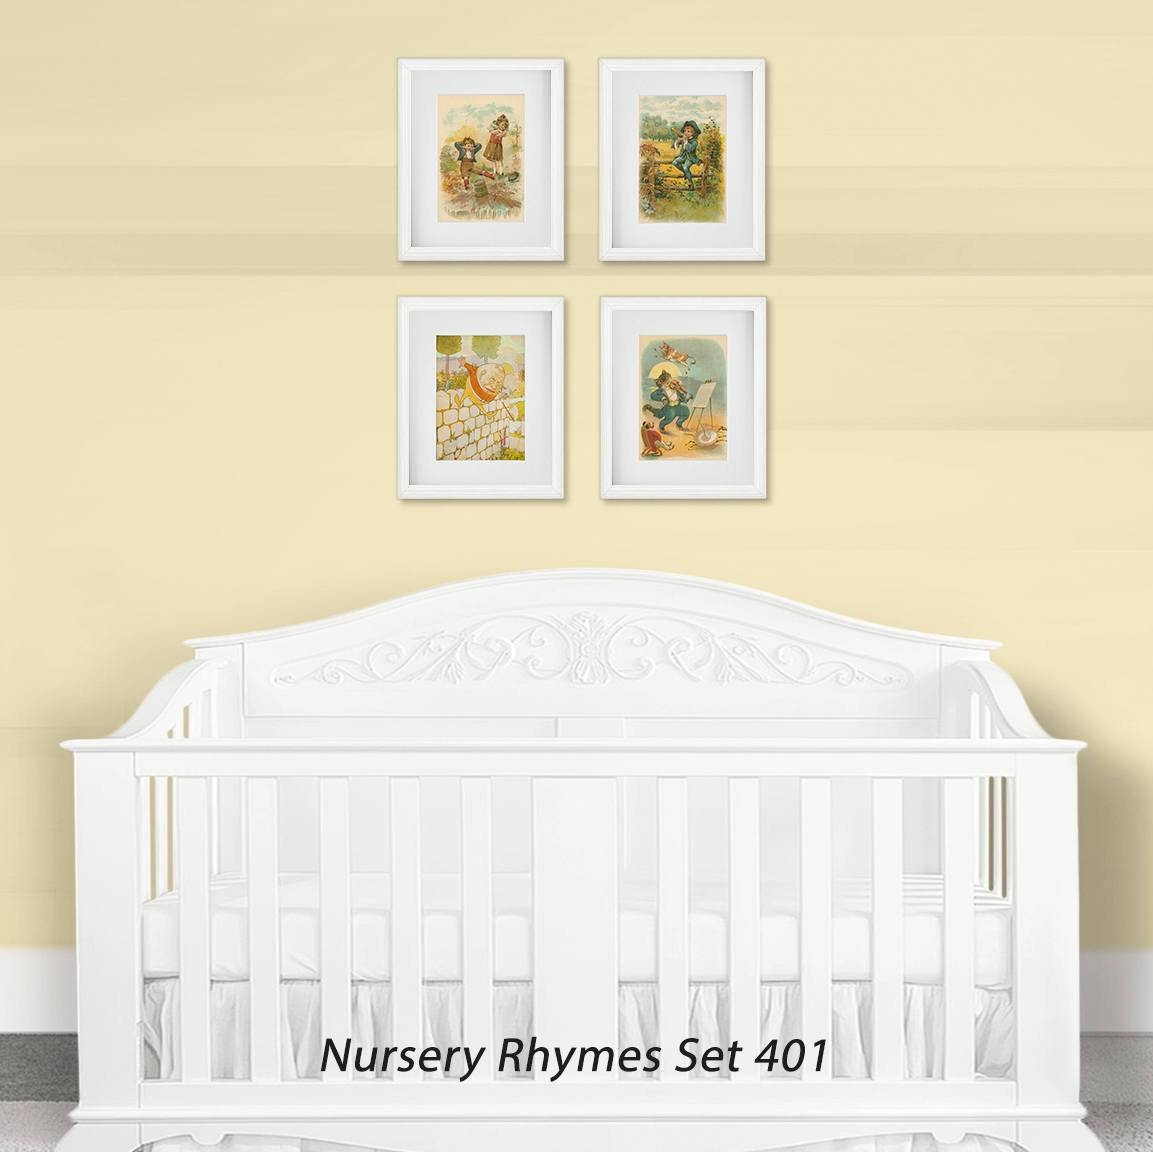 Nursery Wall Art Print Set, Children's Nursery Rhymes, Baby Shower With Most Popular Nursery Framed Wall Art (View 12 of 20)